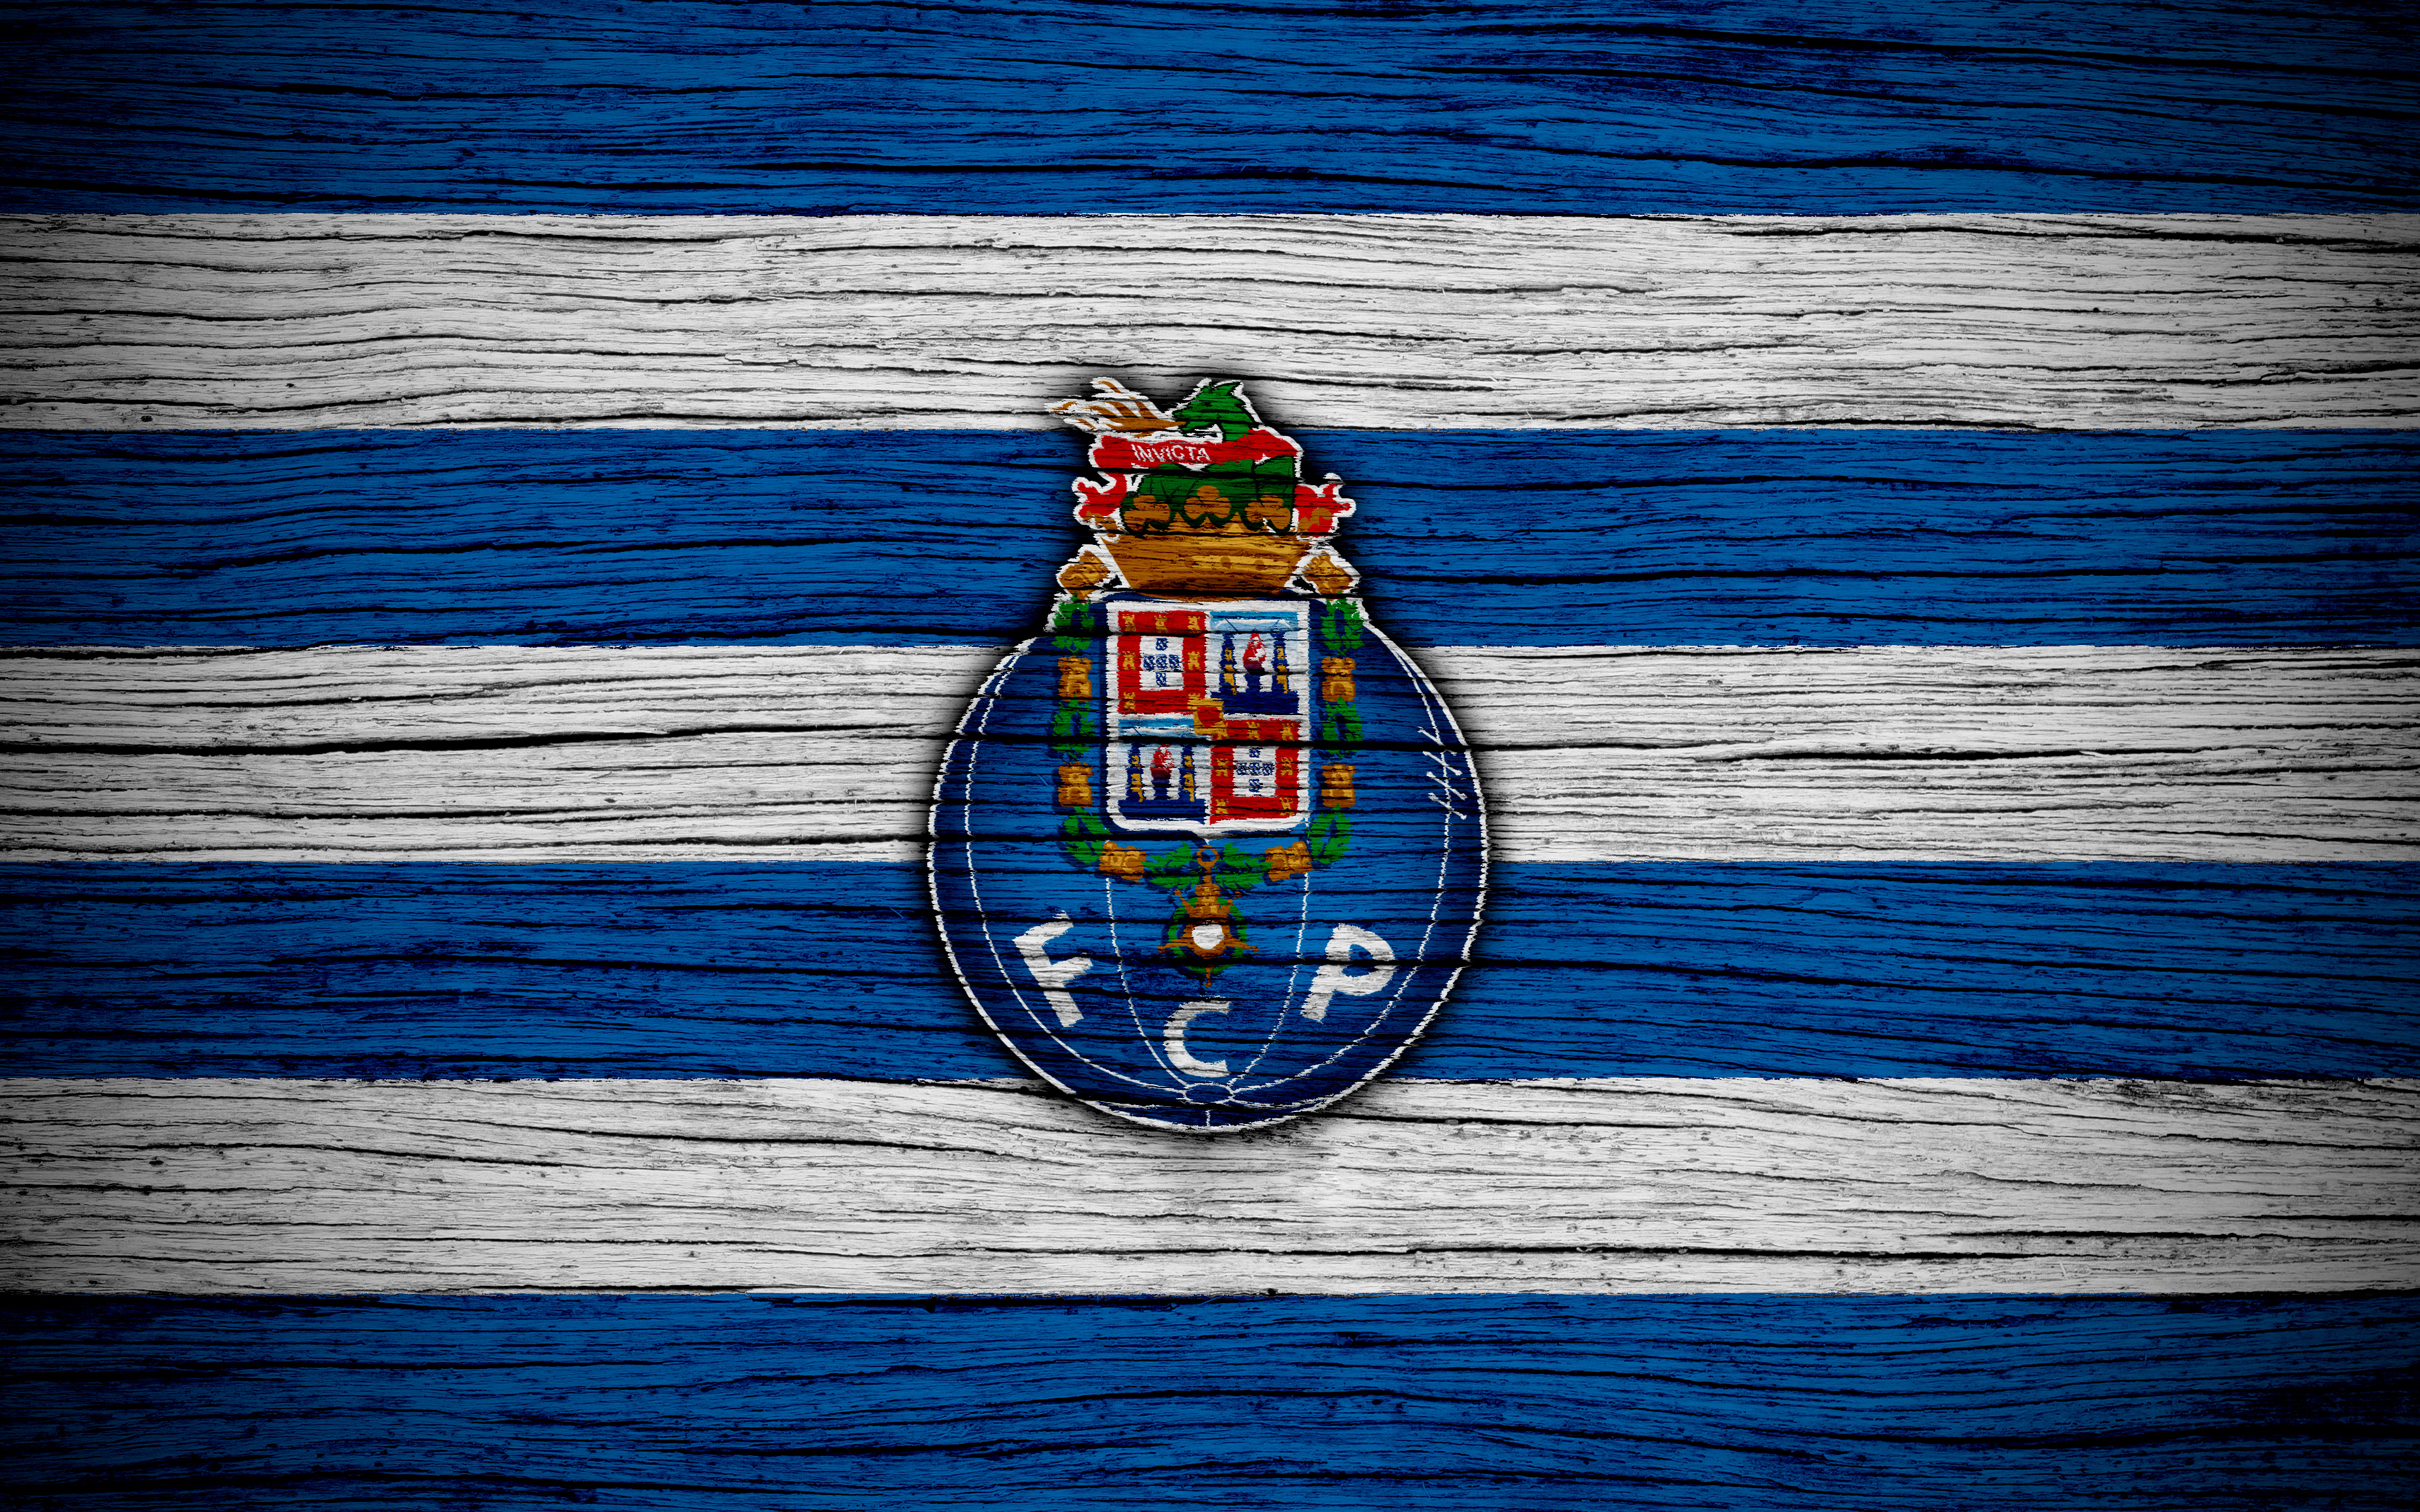 FC Porto 4k Ultra HD Wallpaper Background Image 3840x2400 ID 3840x2400